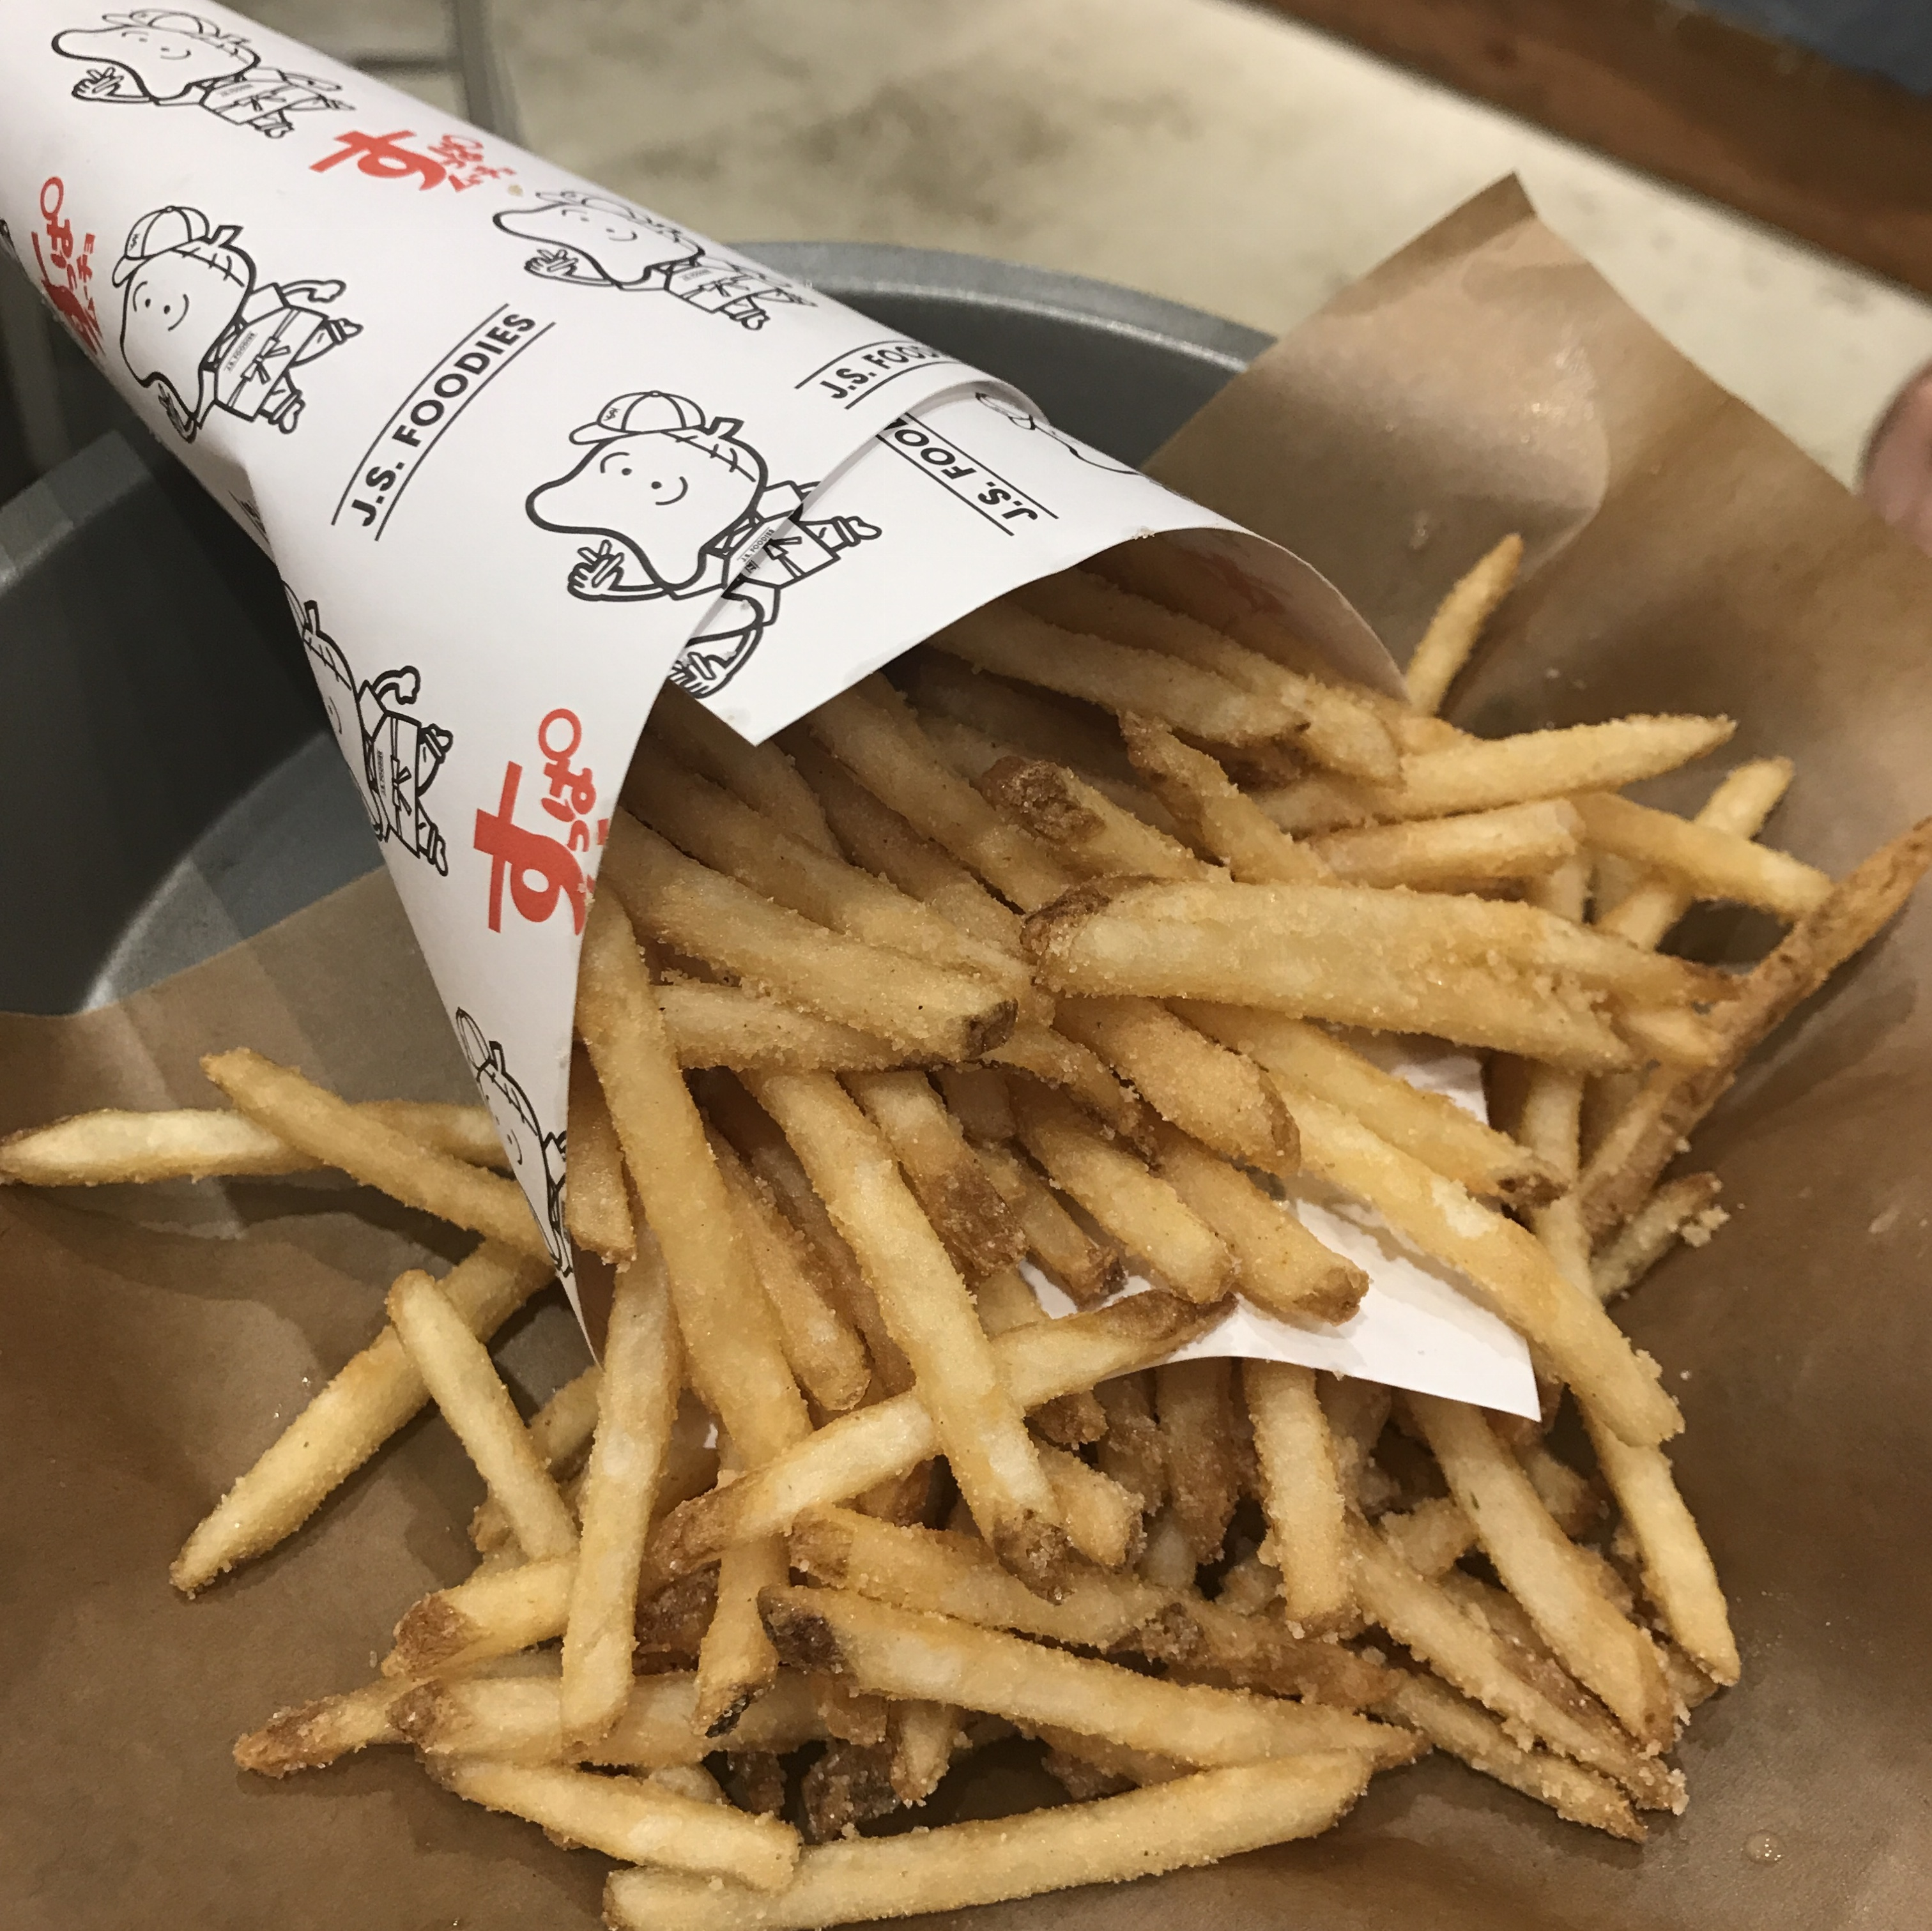 【FOOD】J.S FOODIESが期間限定カラムーチョとコラボ中♡_2